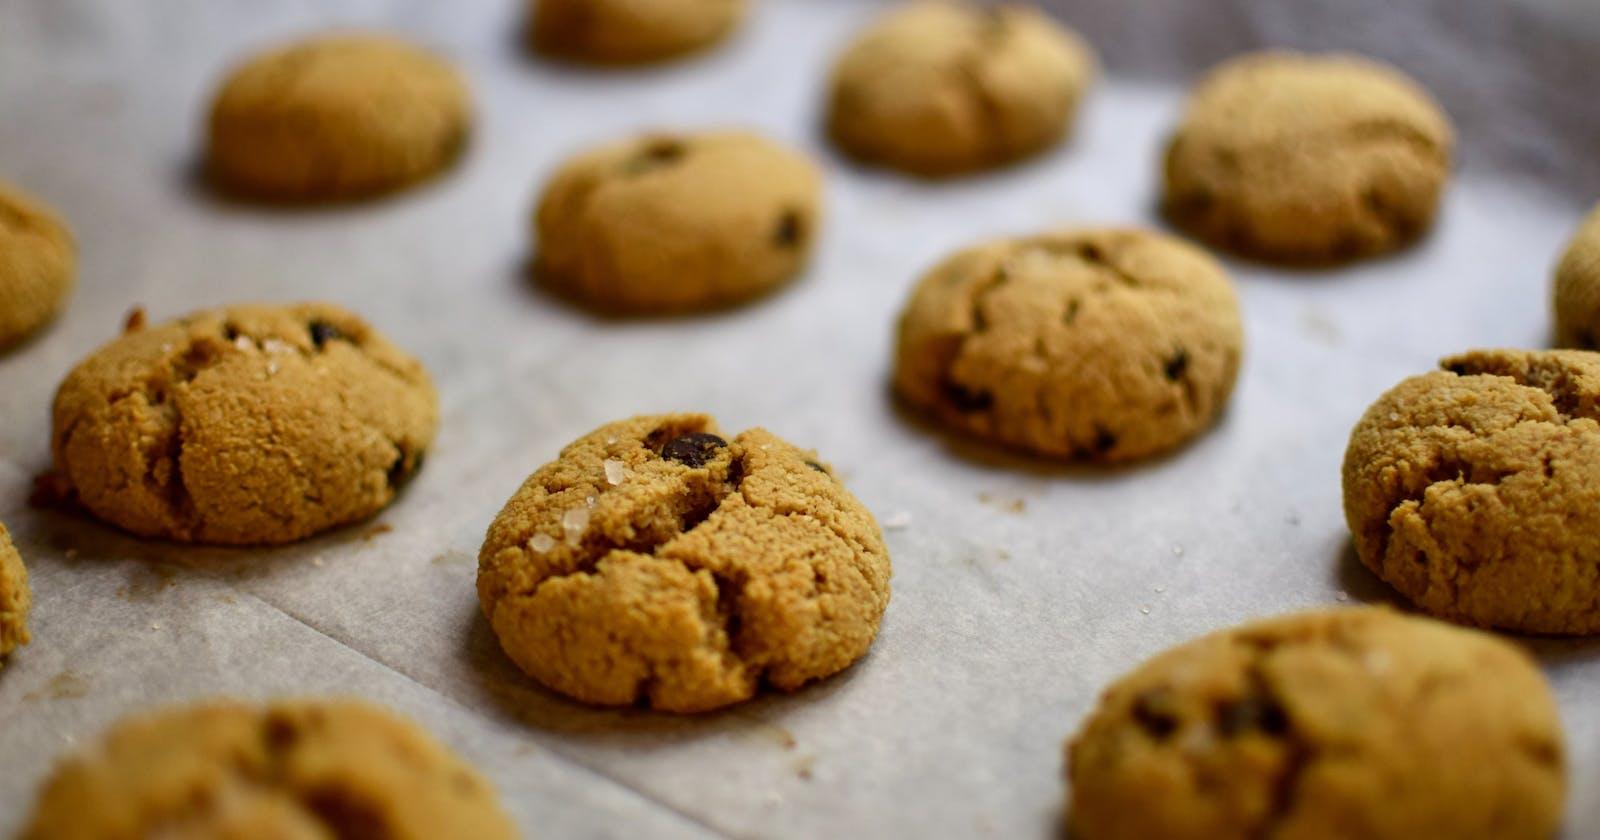 Auth in Web - Cookies Vs Storage